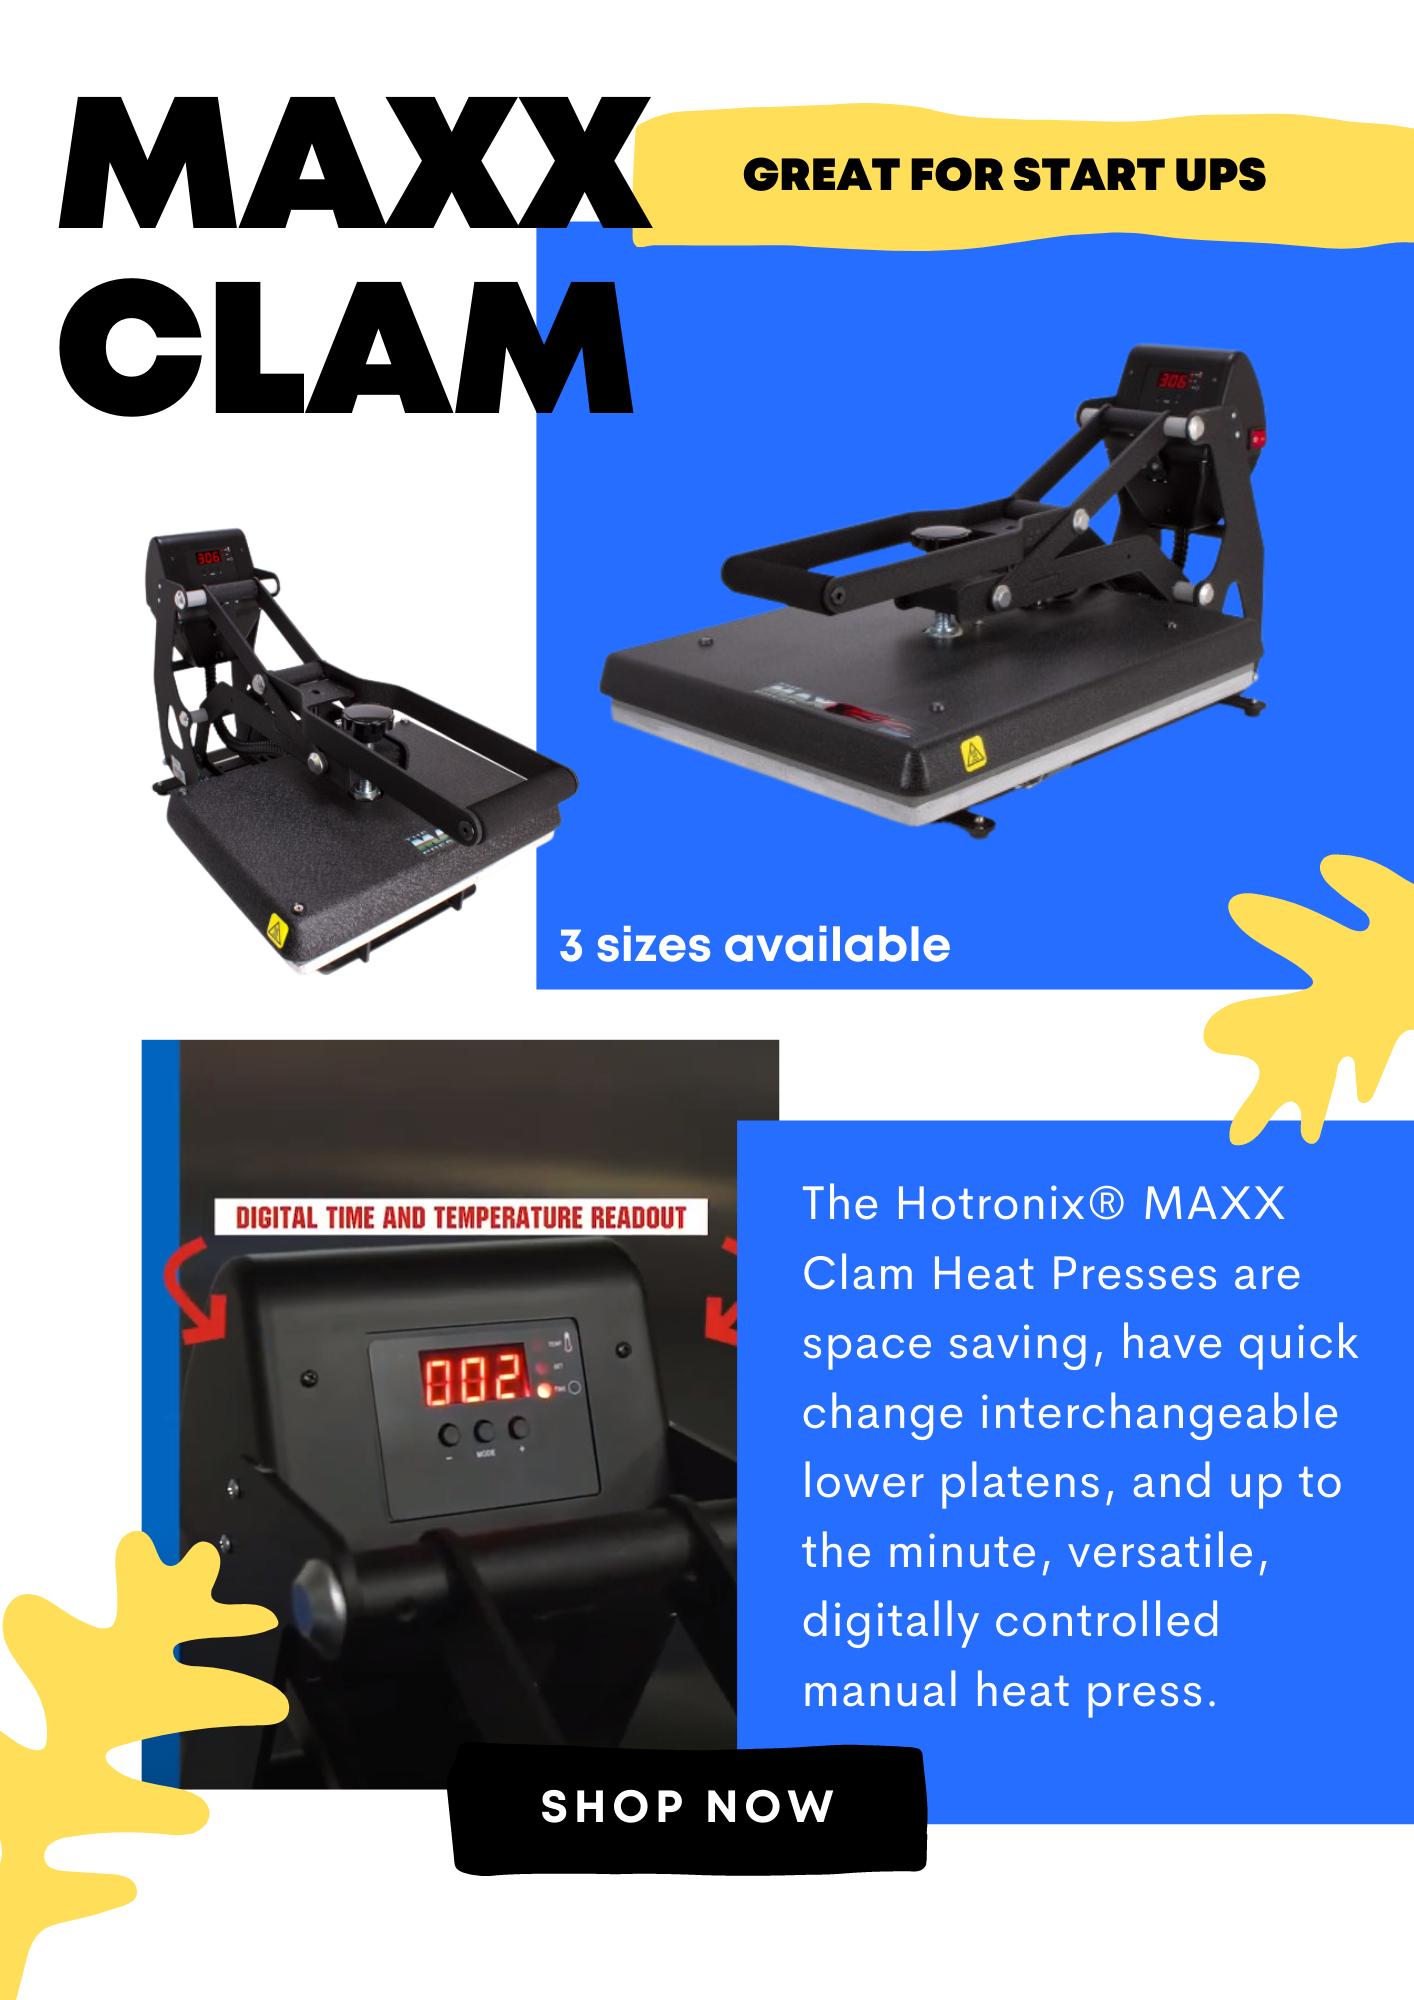 Hotronix MAXX Clam Heat Press